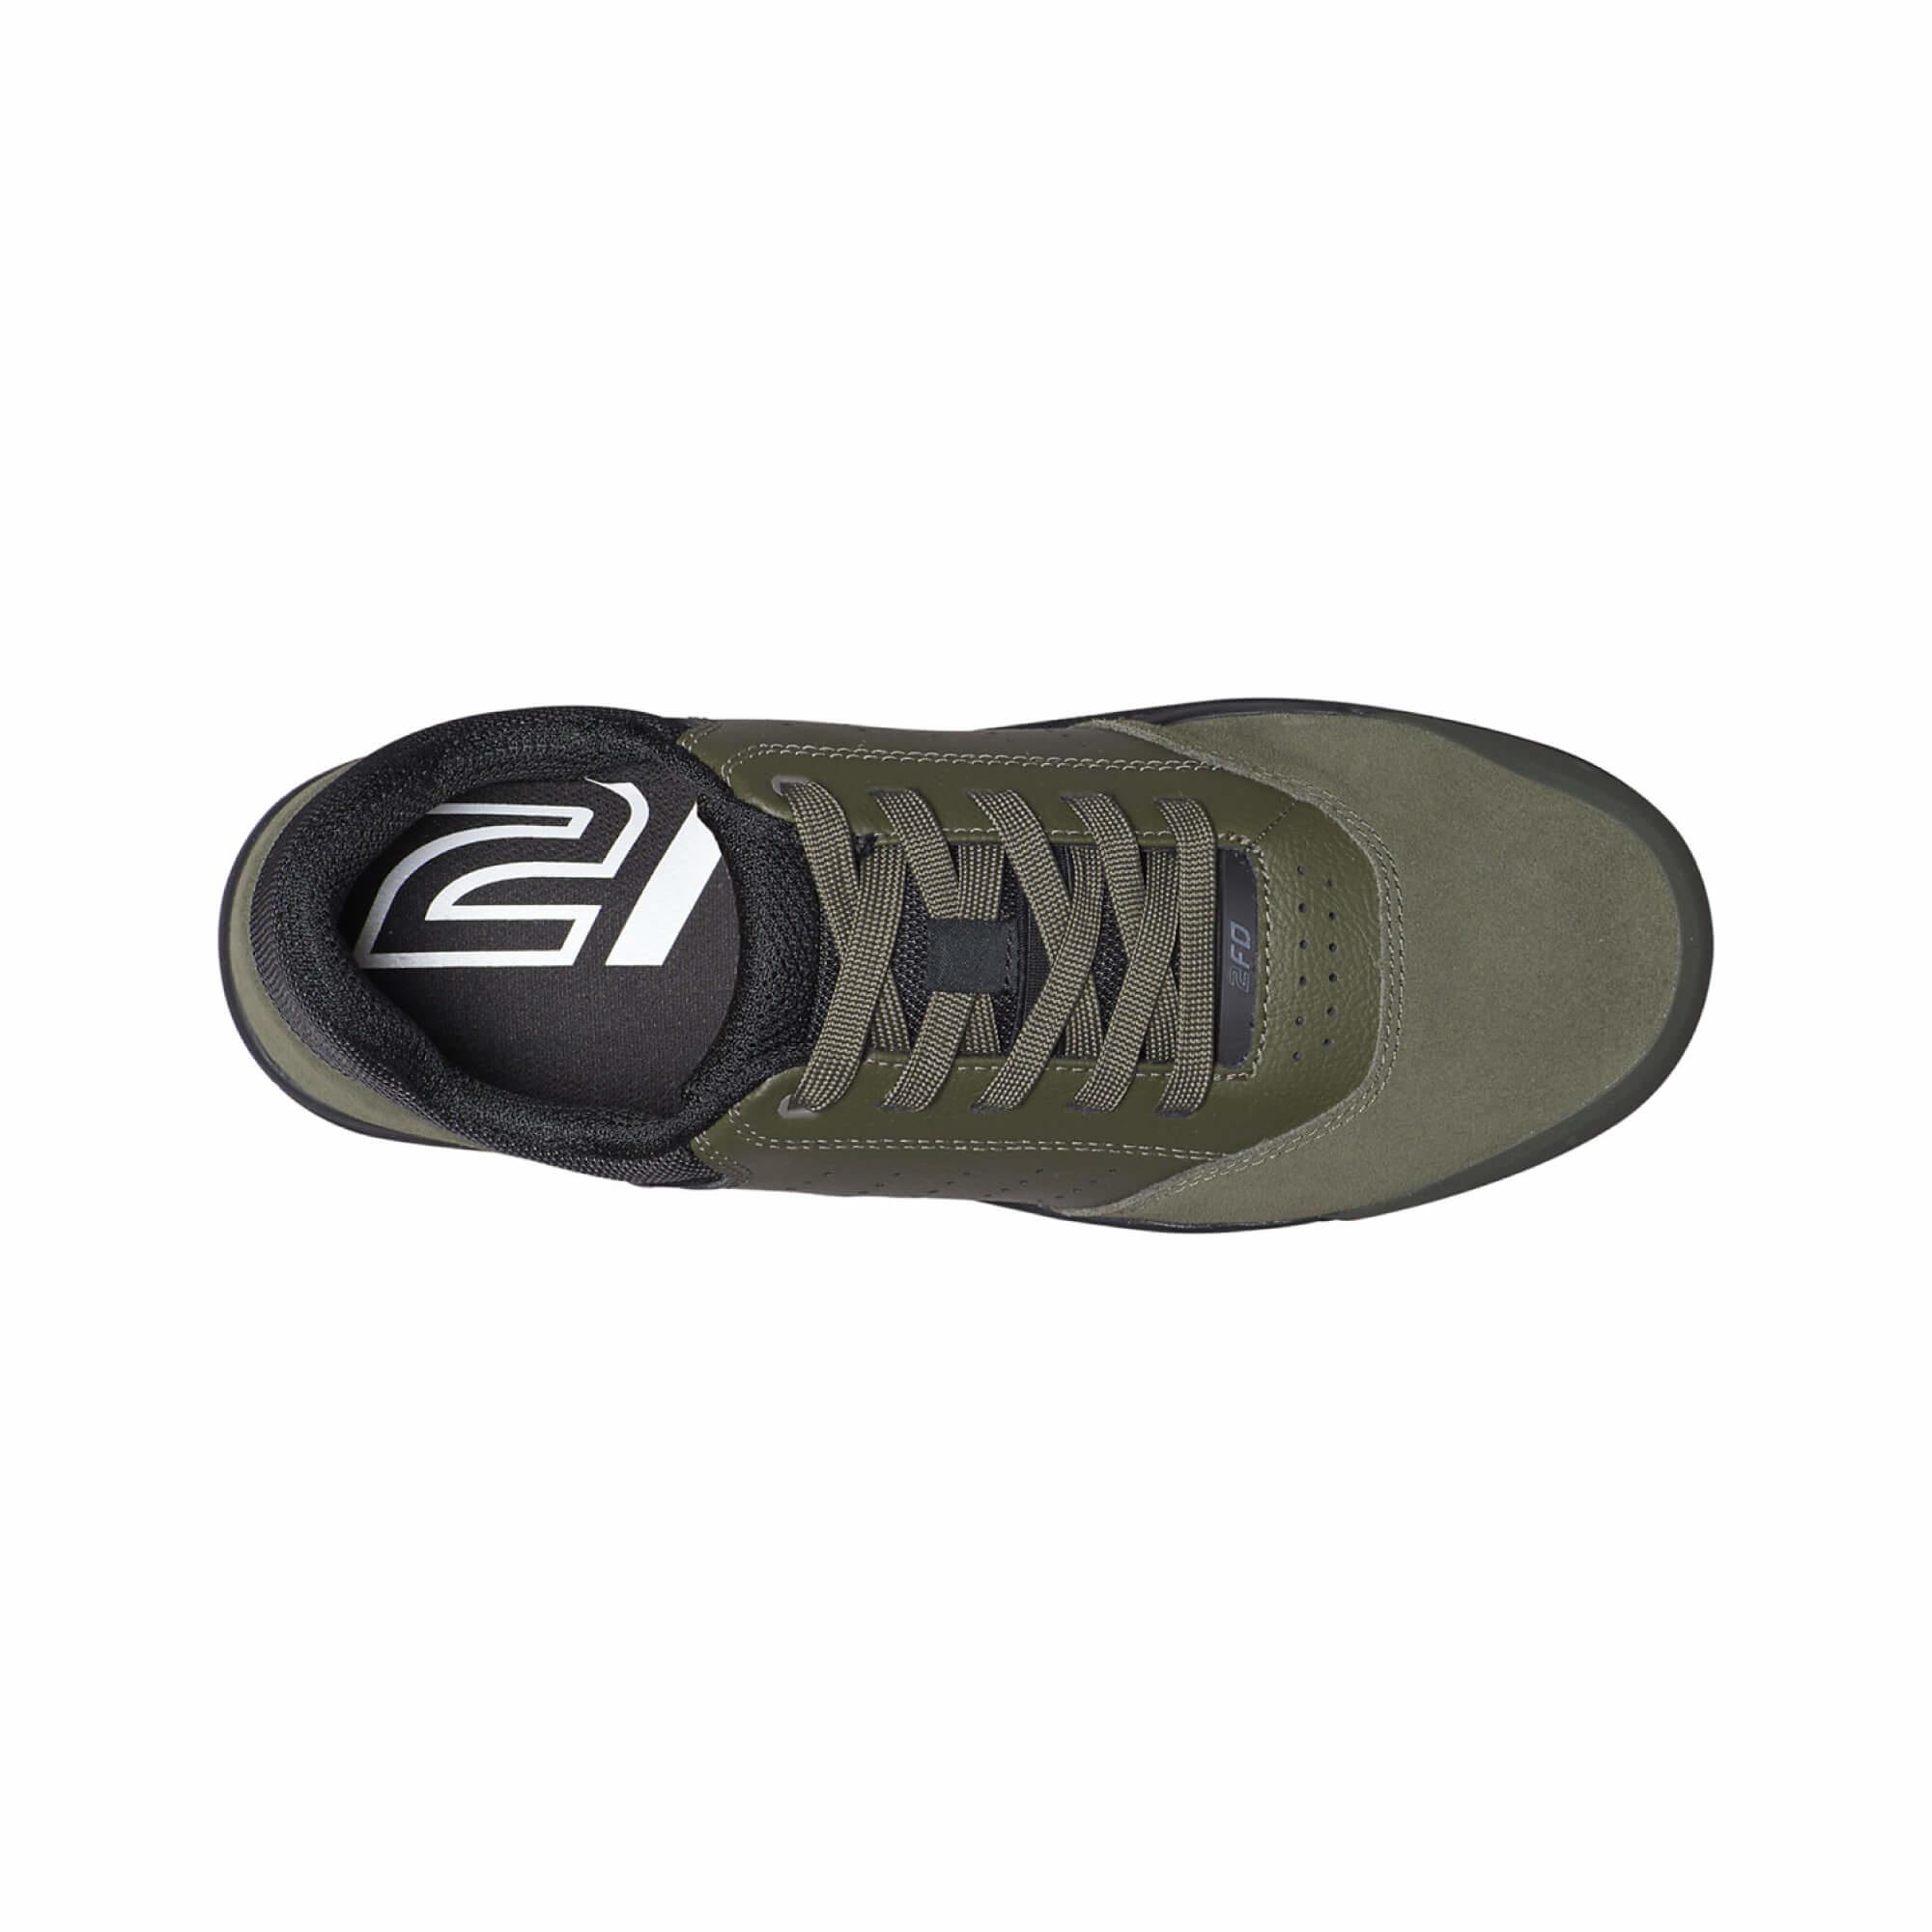 2FO Roost Flat MTB Shoe-8